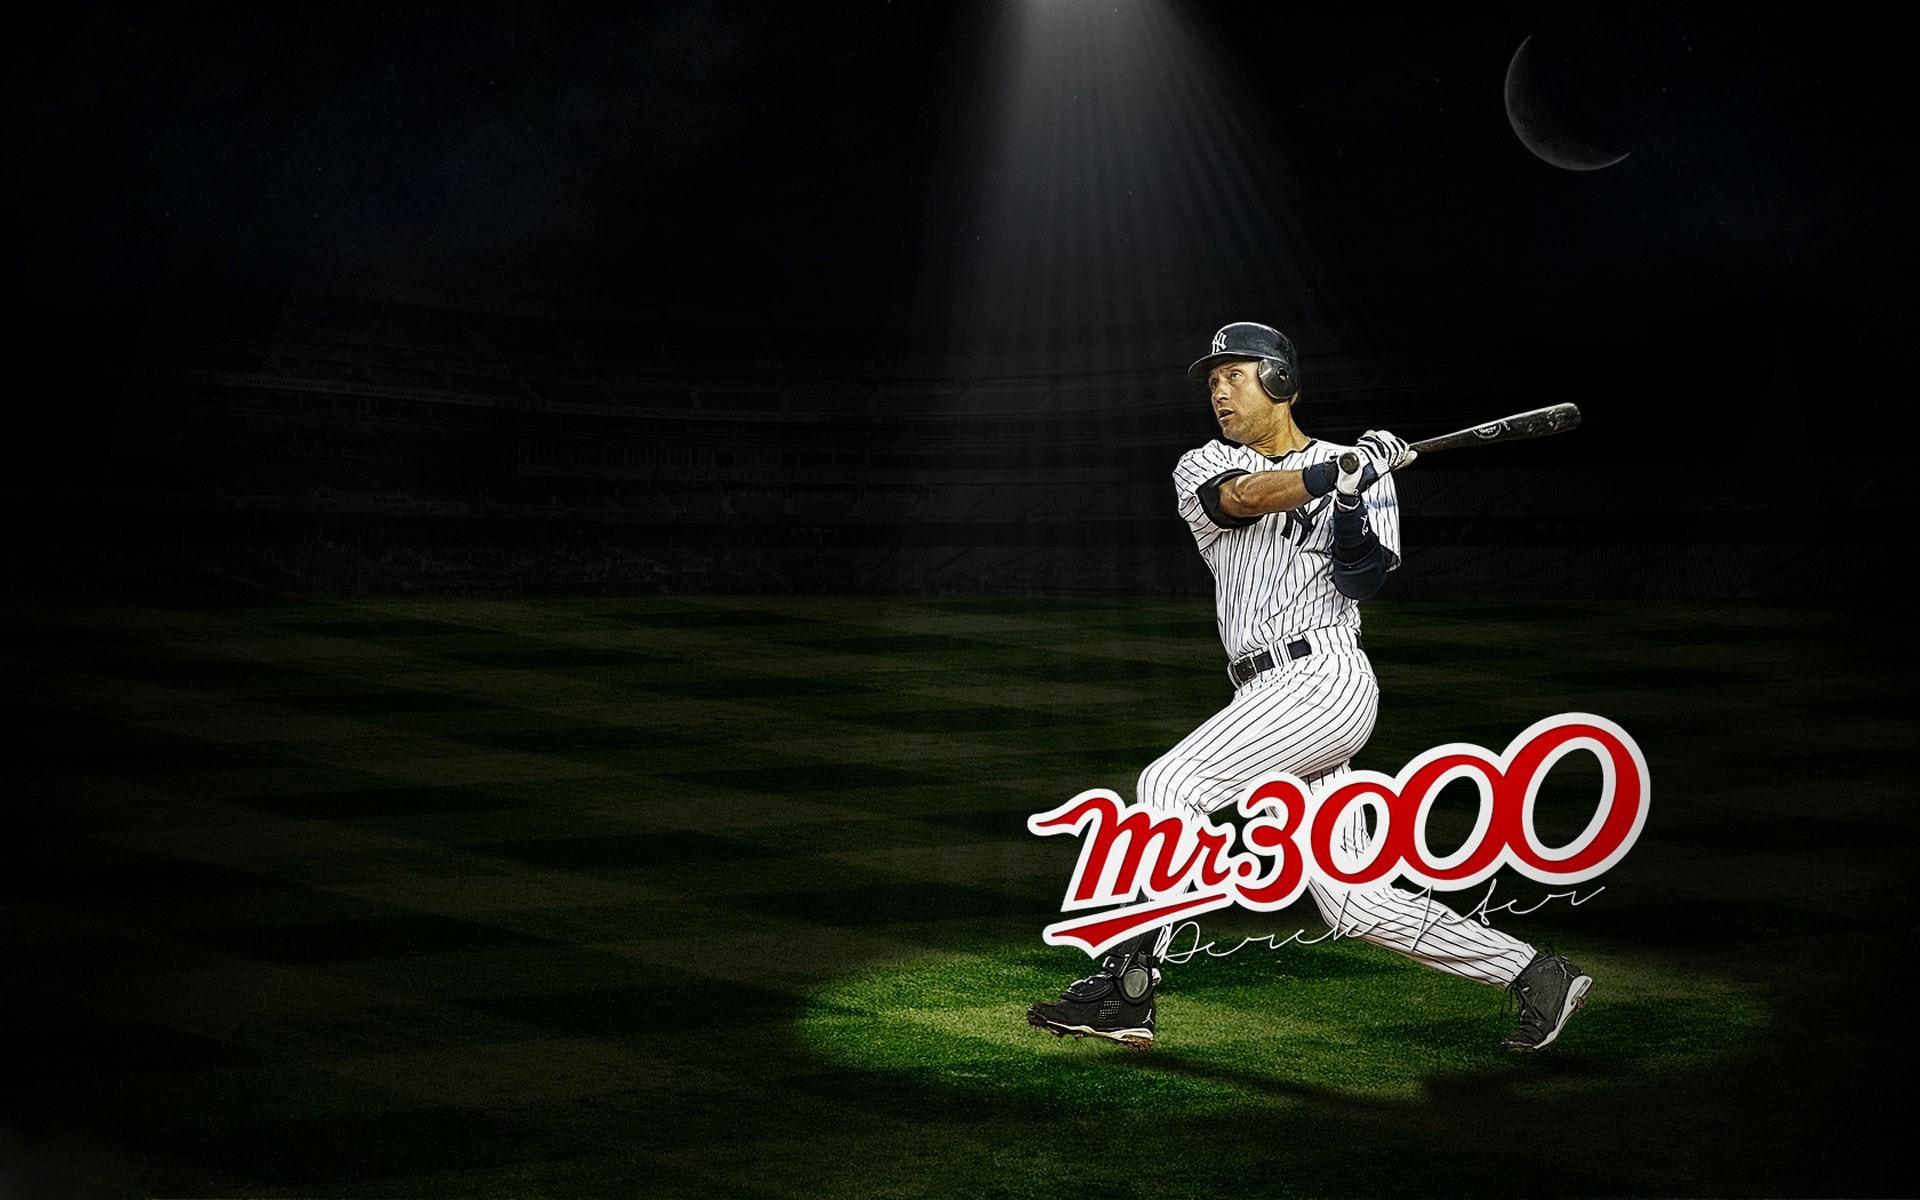 1920x1080 Jack O Lanterns Face Halloween Wide Wallpaper Download 1920x1200 Sports New York Yankees